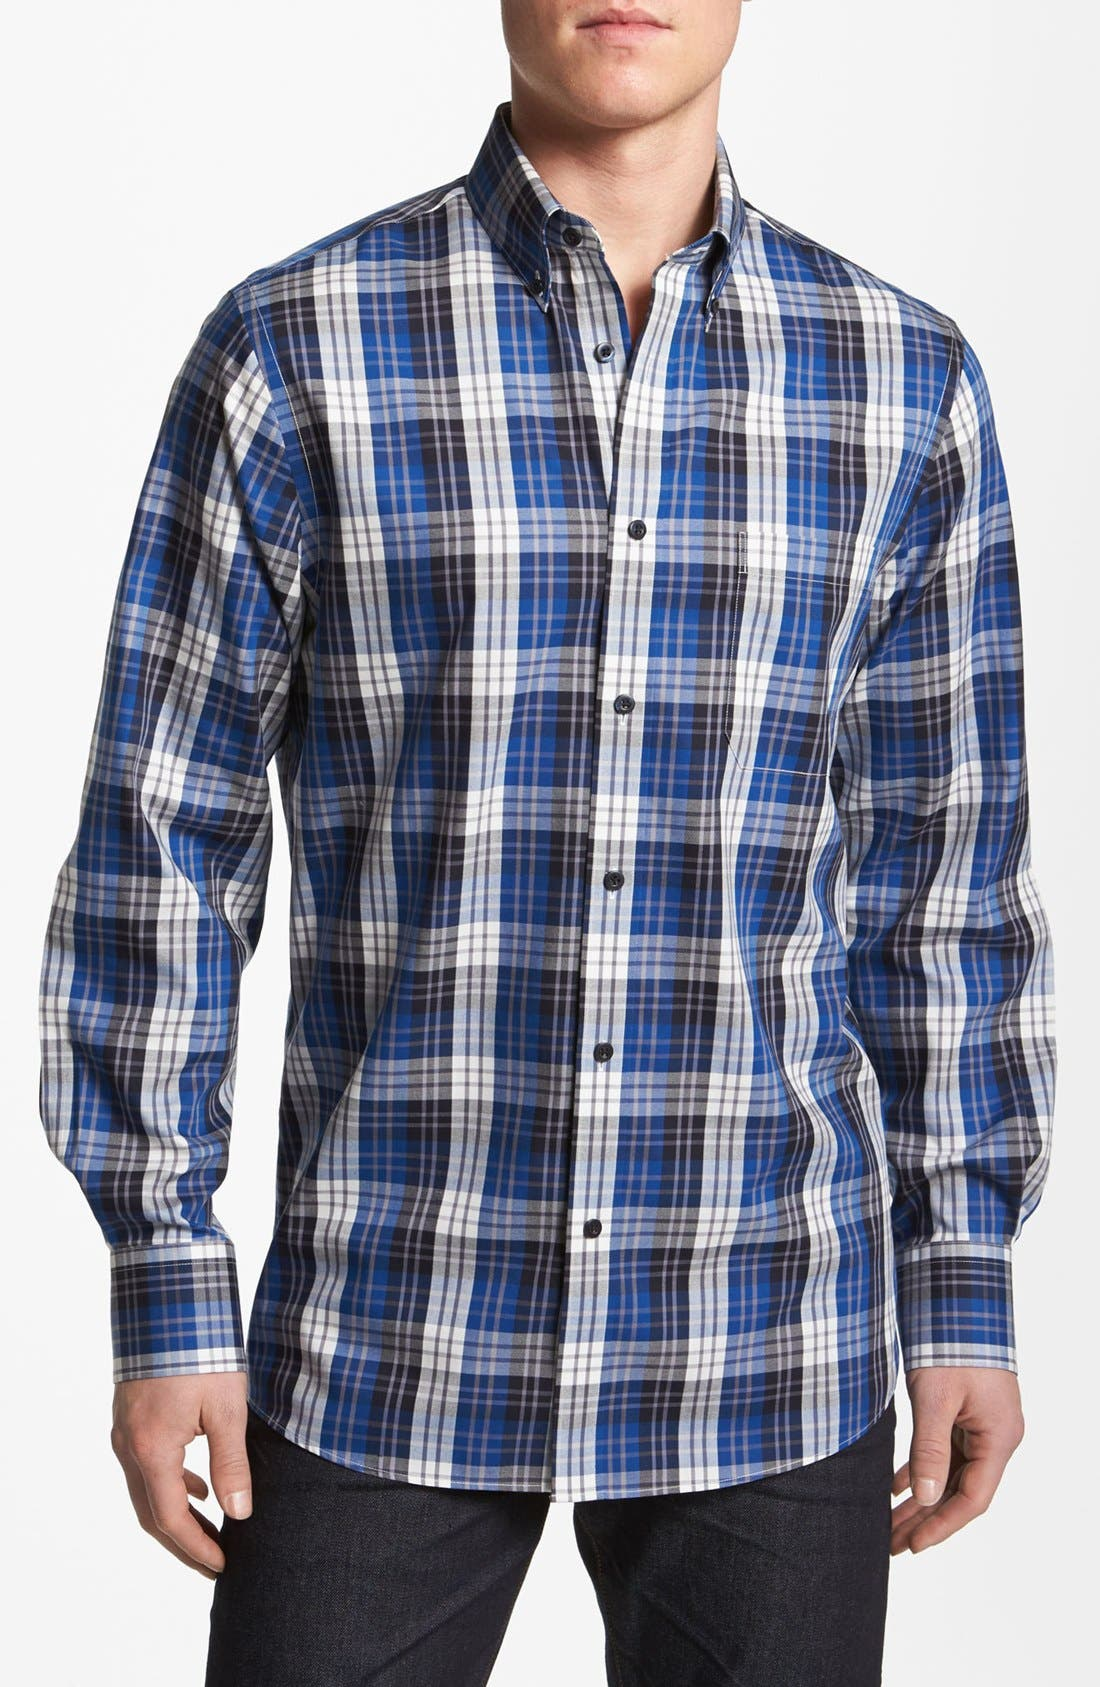 Alternate Image 1 Selected - Nordstrom Smartcare™ Plaid Oxford Sport Shirt